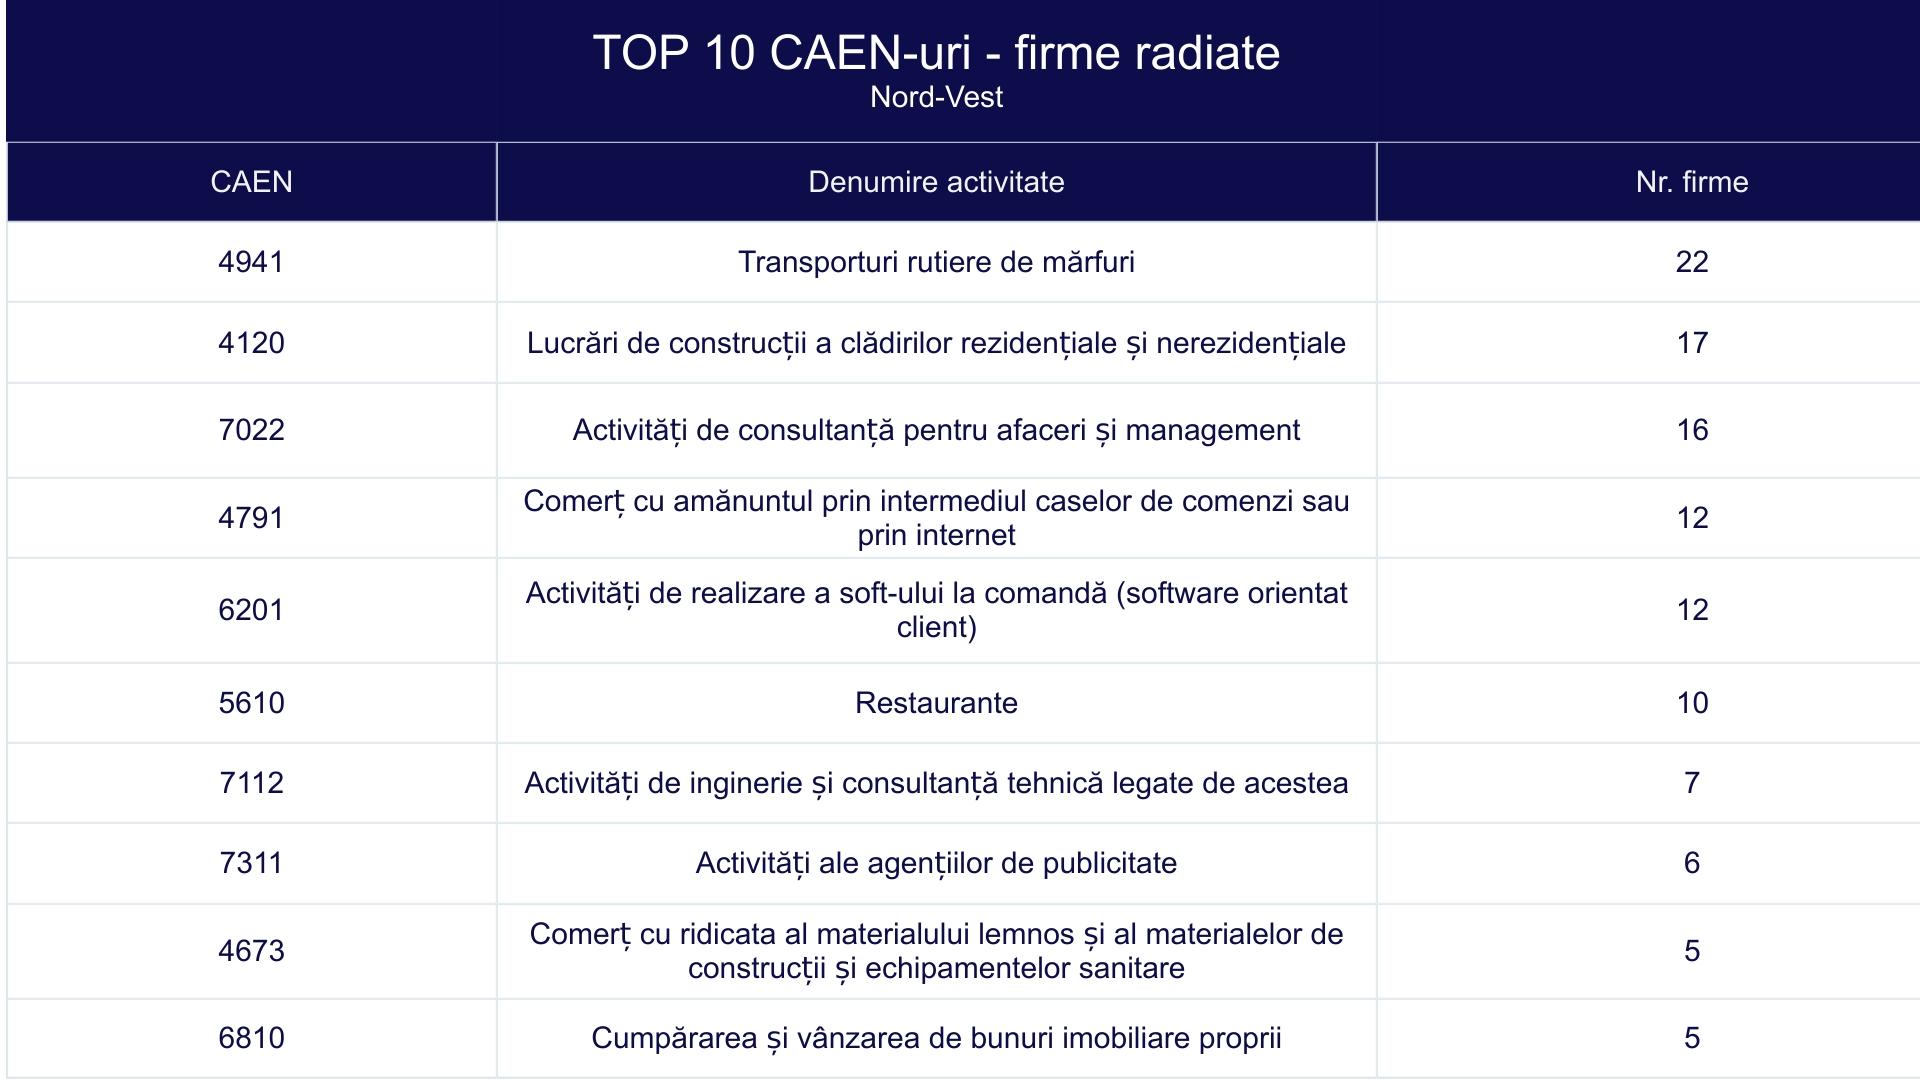 TOP 10 CAEN-uri - firme radiate - Nord-Vest